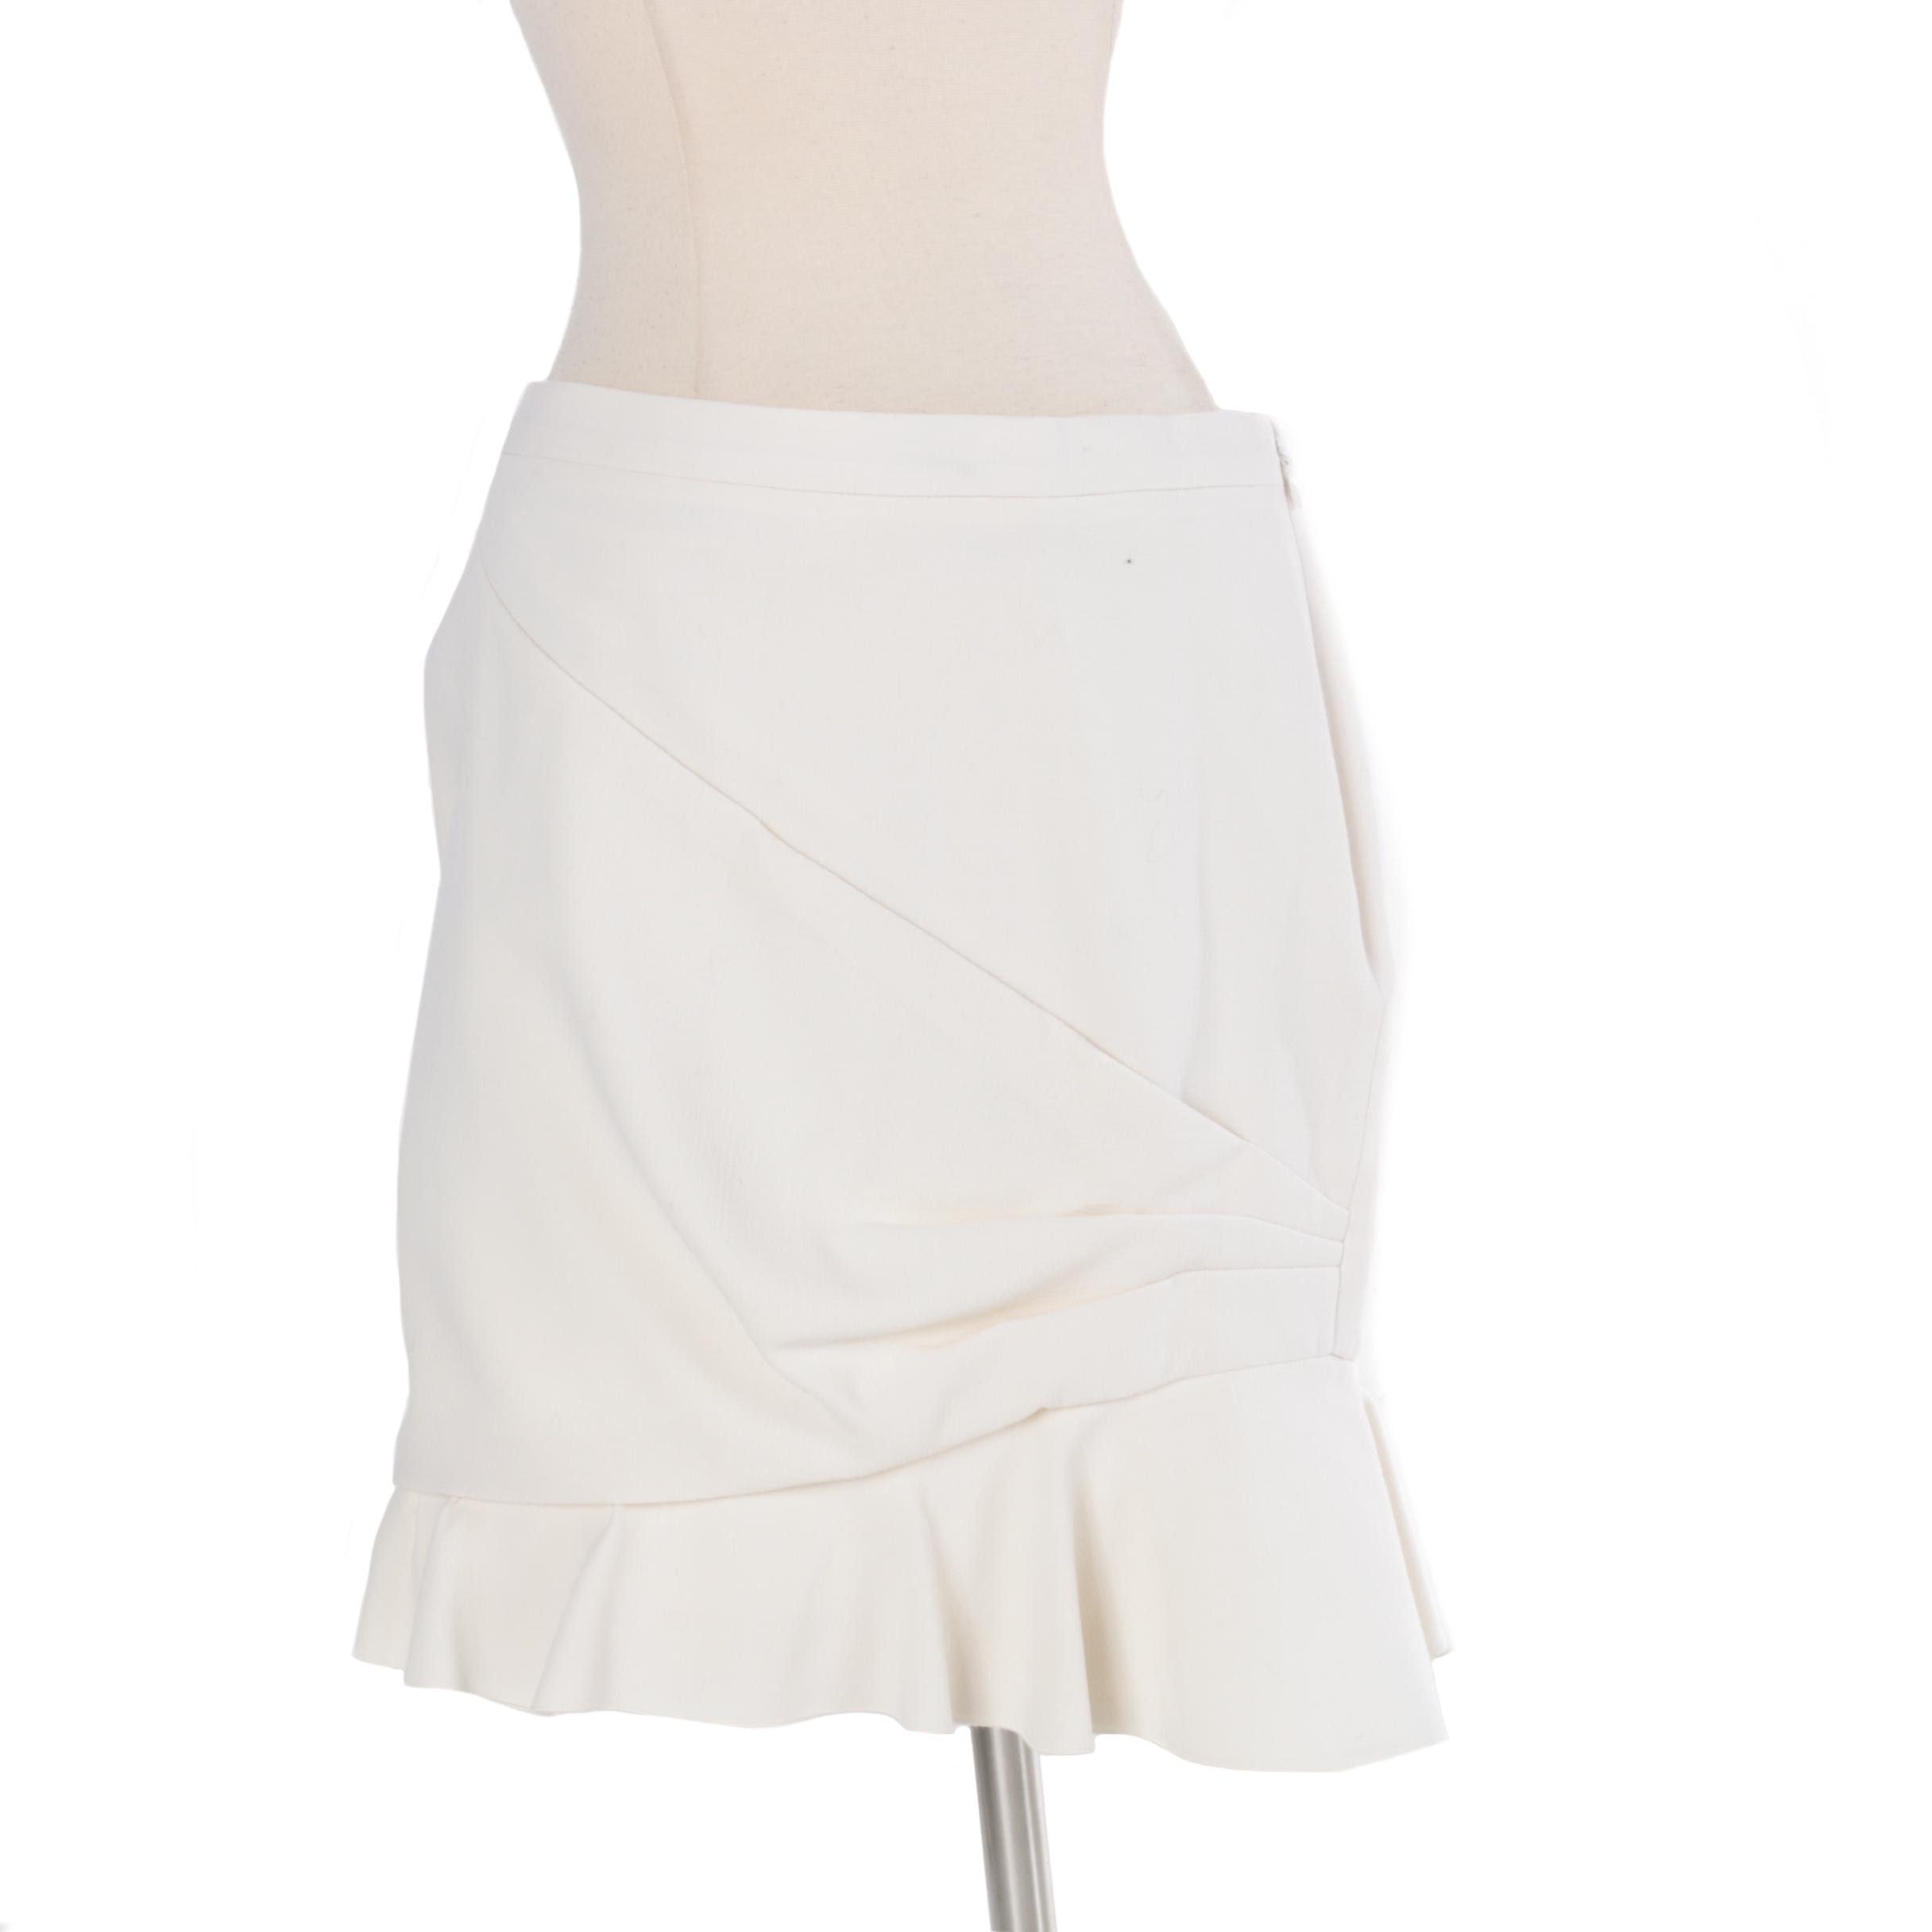 Emilio Pucci Wool Skirt